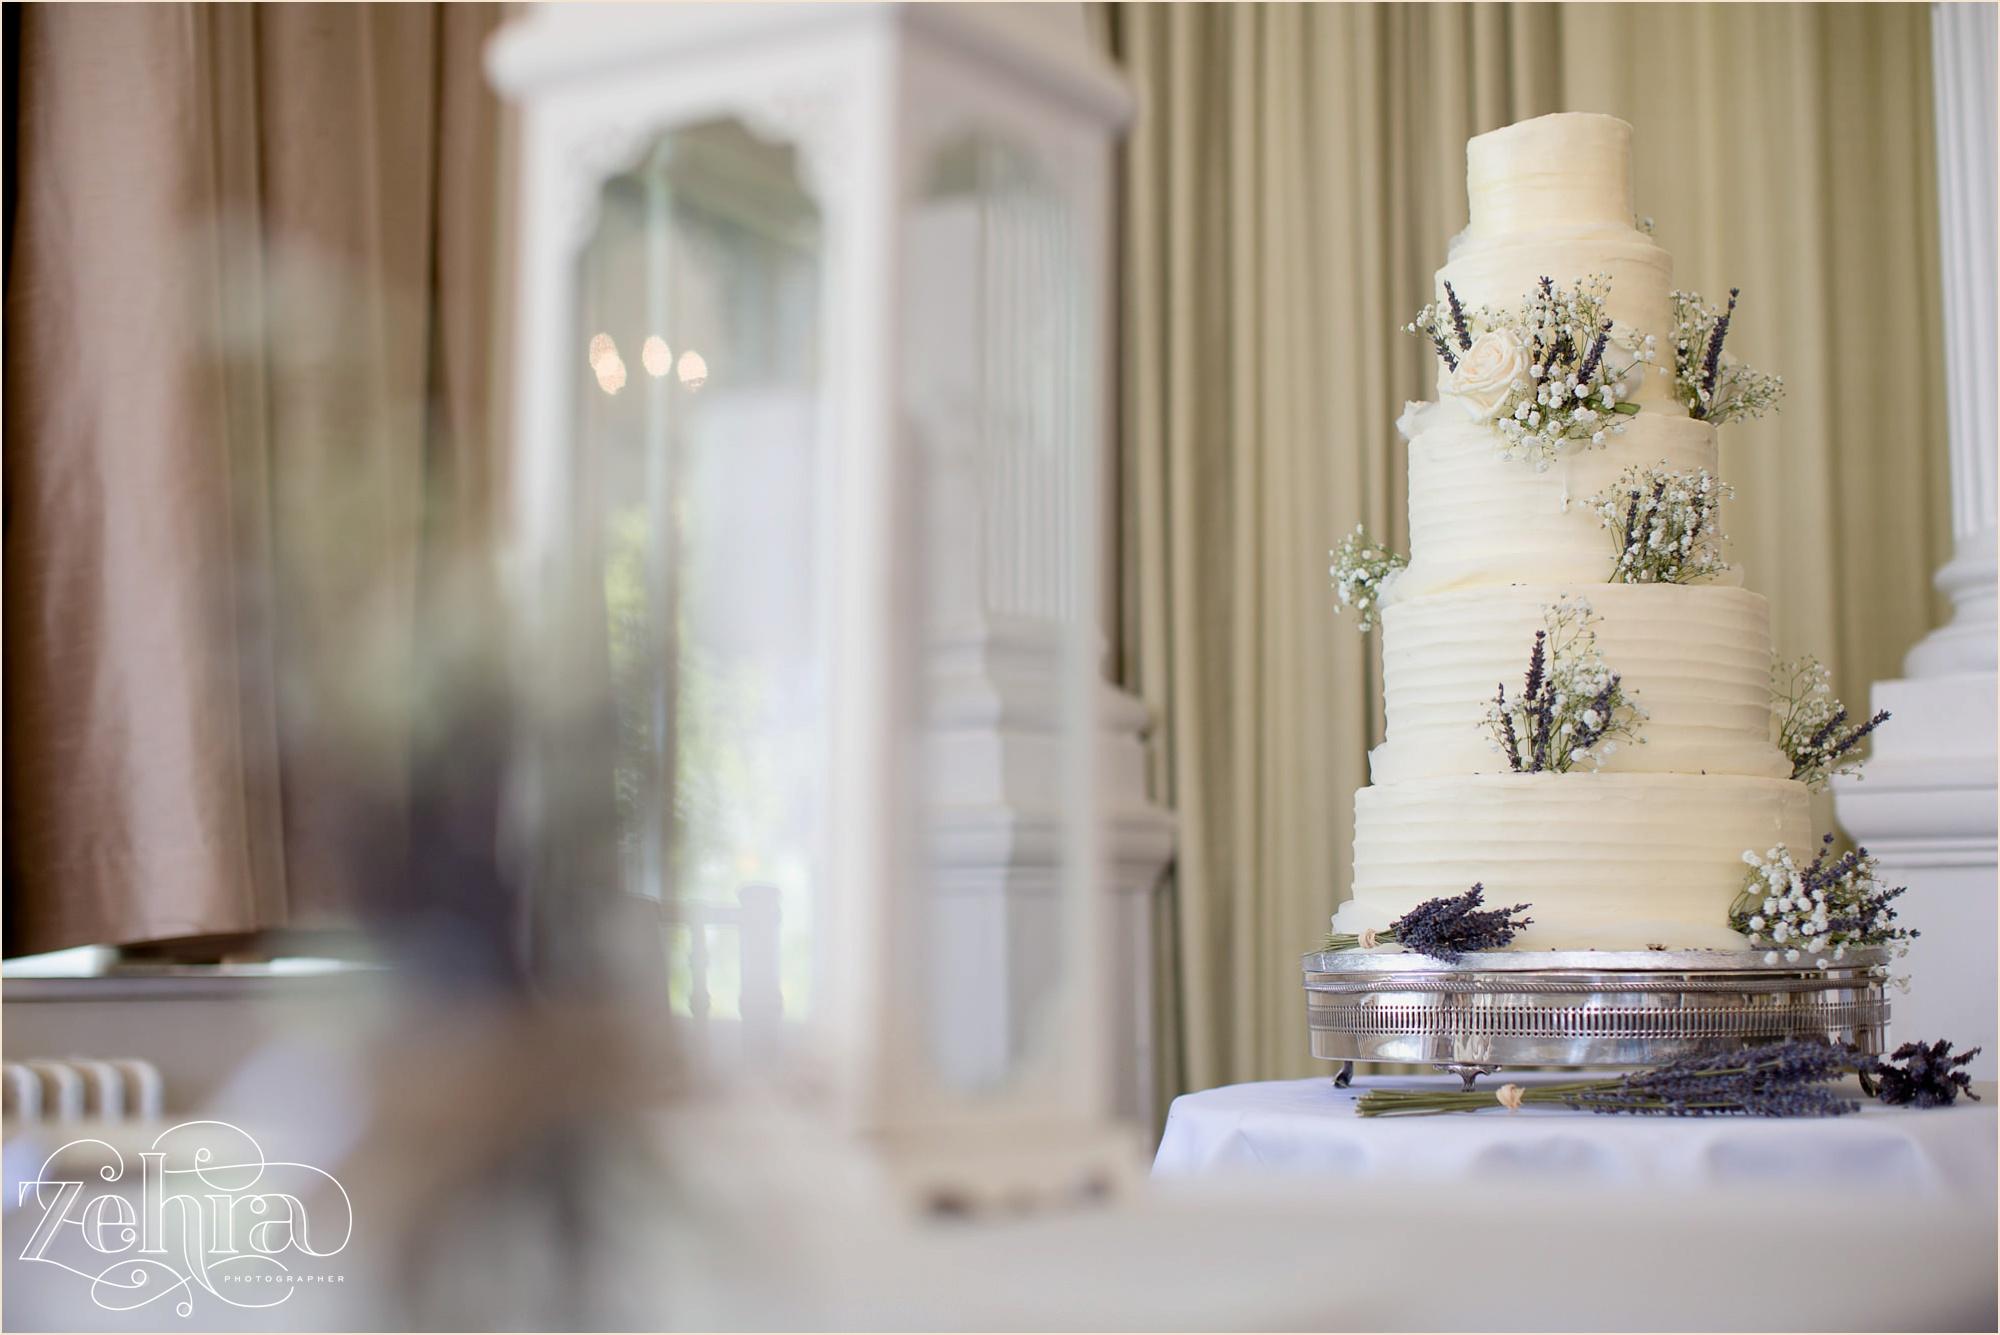 jasira manchester wedding photographer_0068.jpg